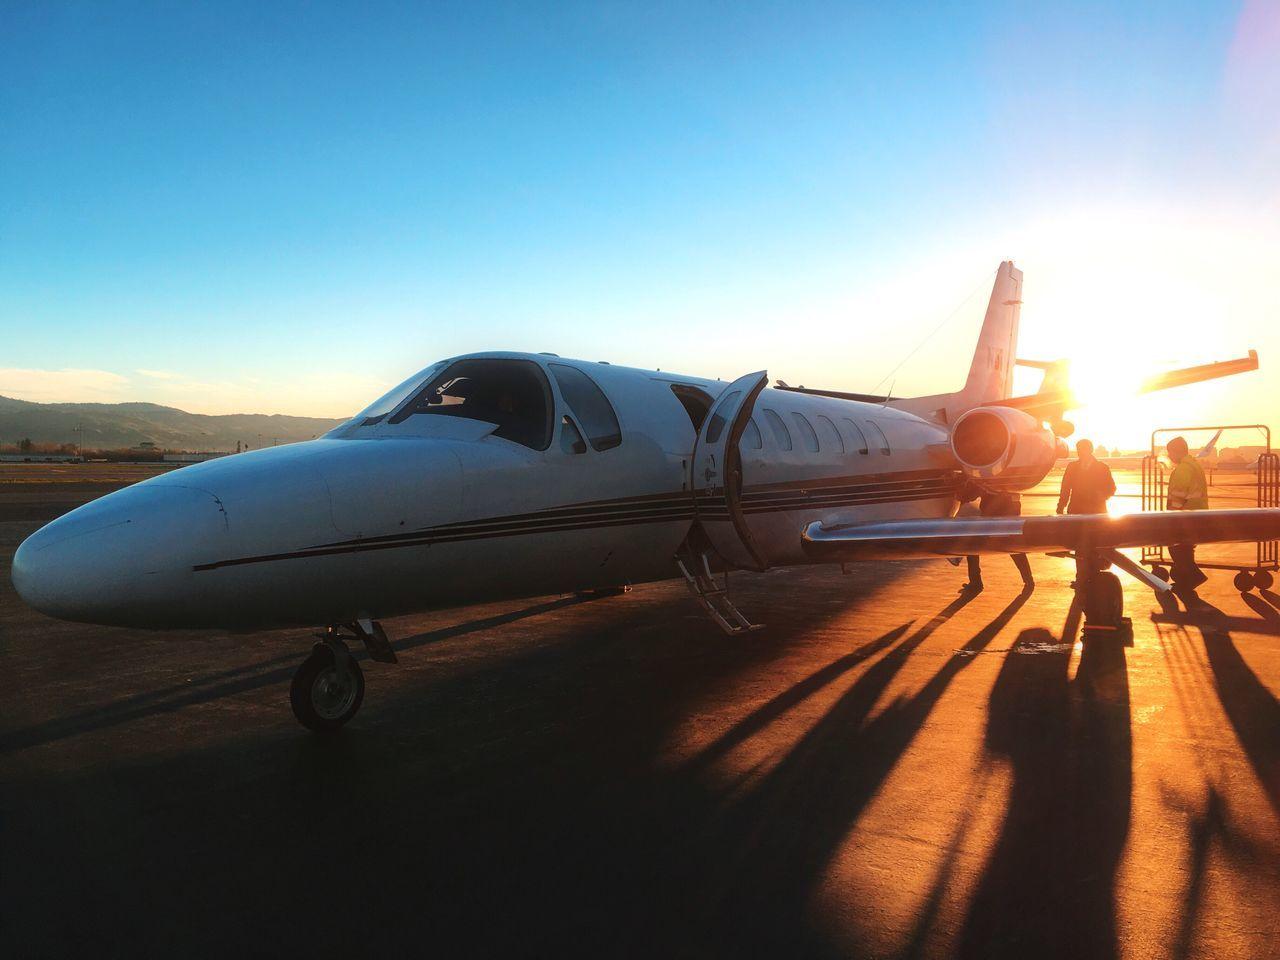 Beautiful stock photos of flugzeug, transportation, sunset, sunlight, airplane